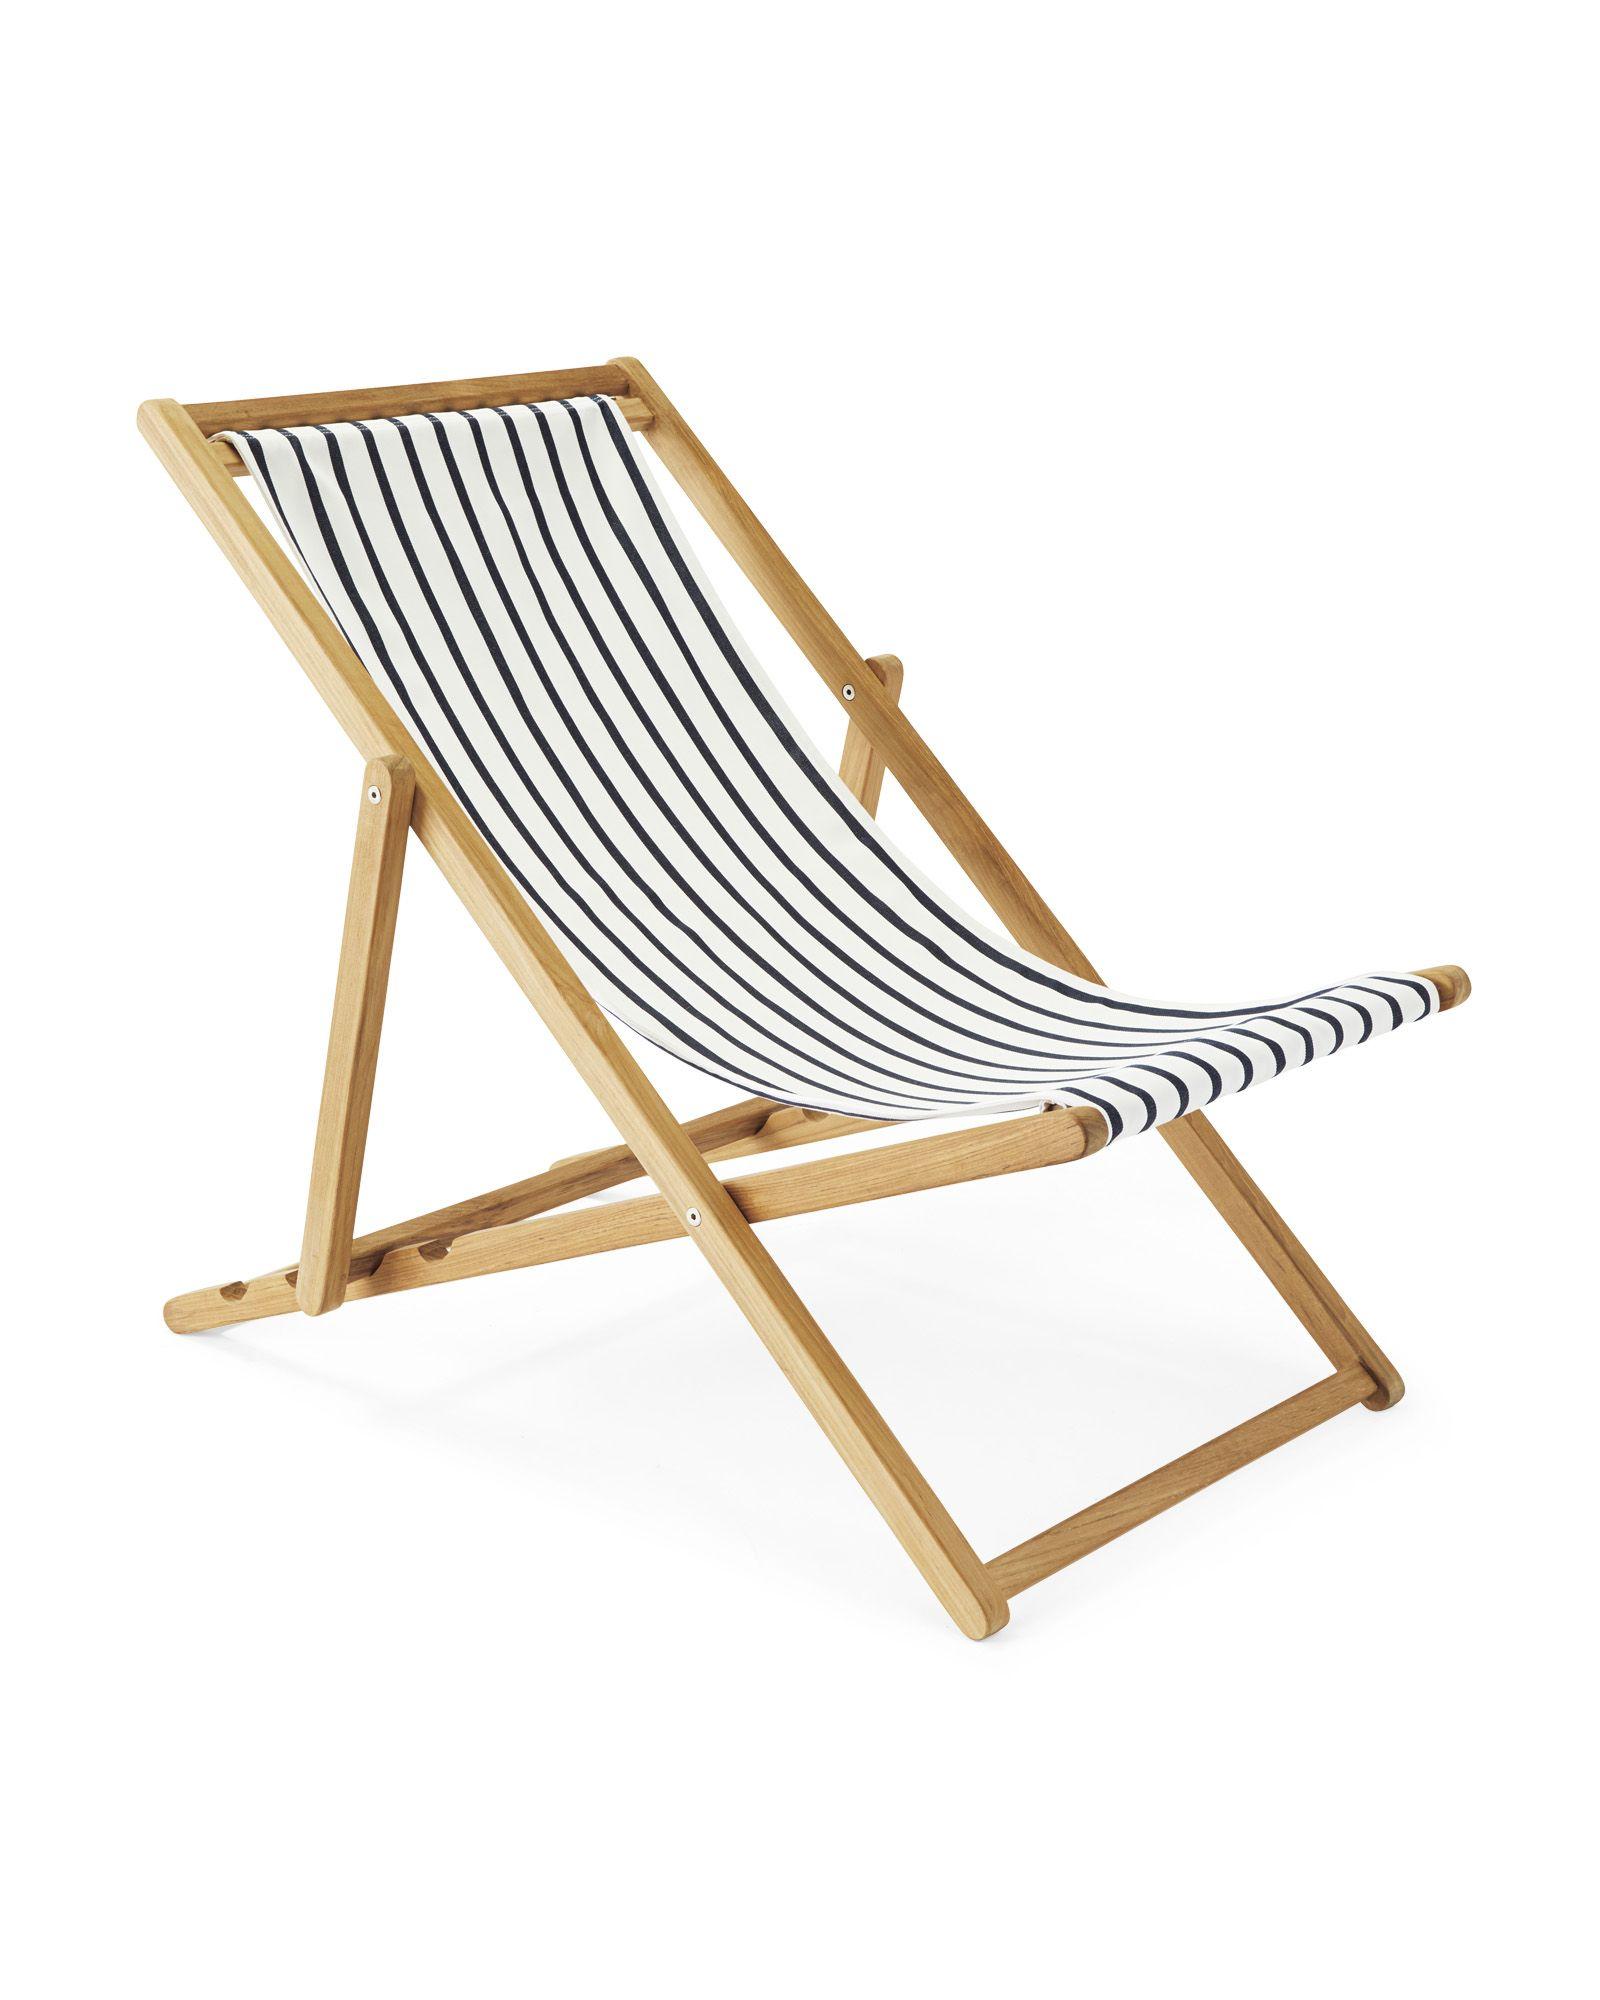 Serena u0026 Lily Teak Sling Chair  sc 1 st  Pinterest & Serena u0026 Lily Teak Sling Chair | Products | Pinterest | Teak and ...